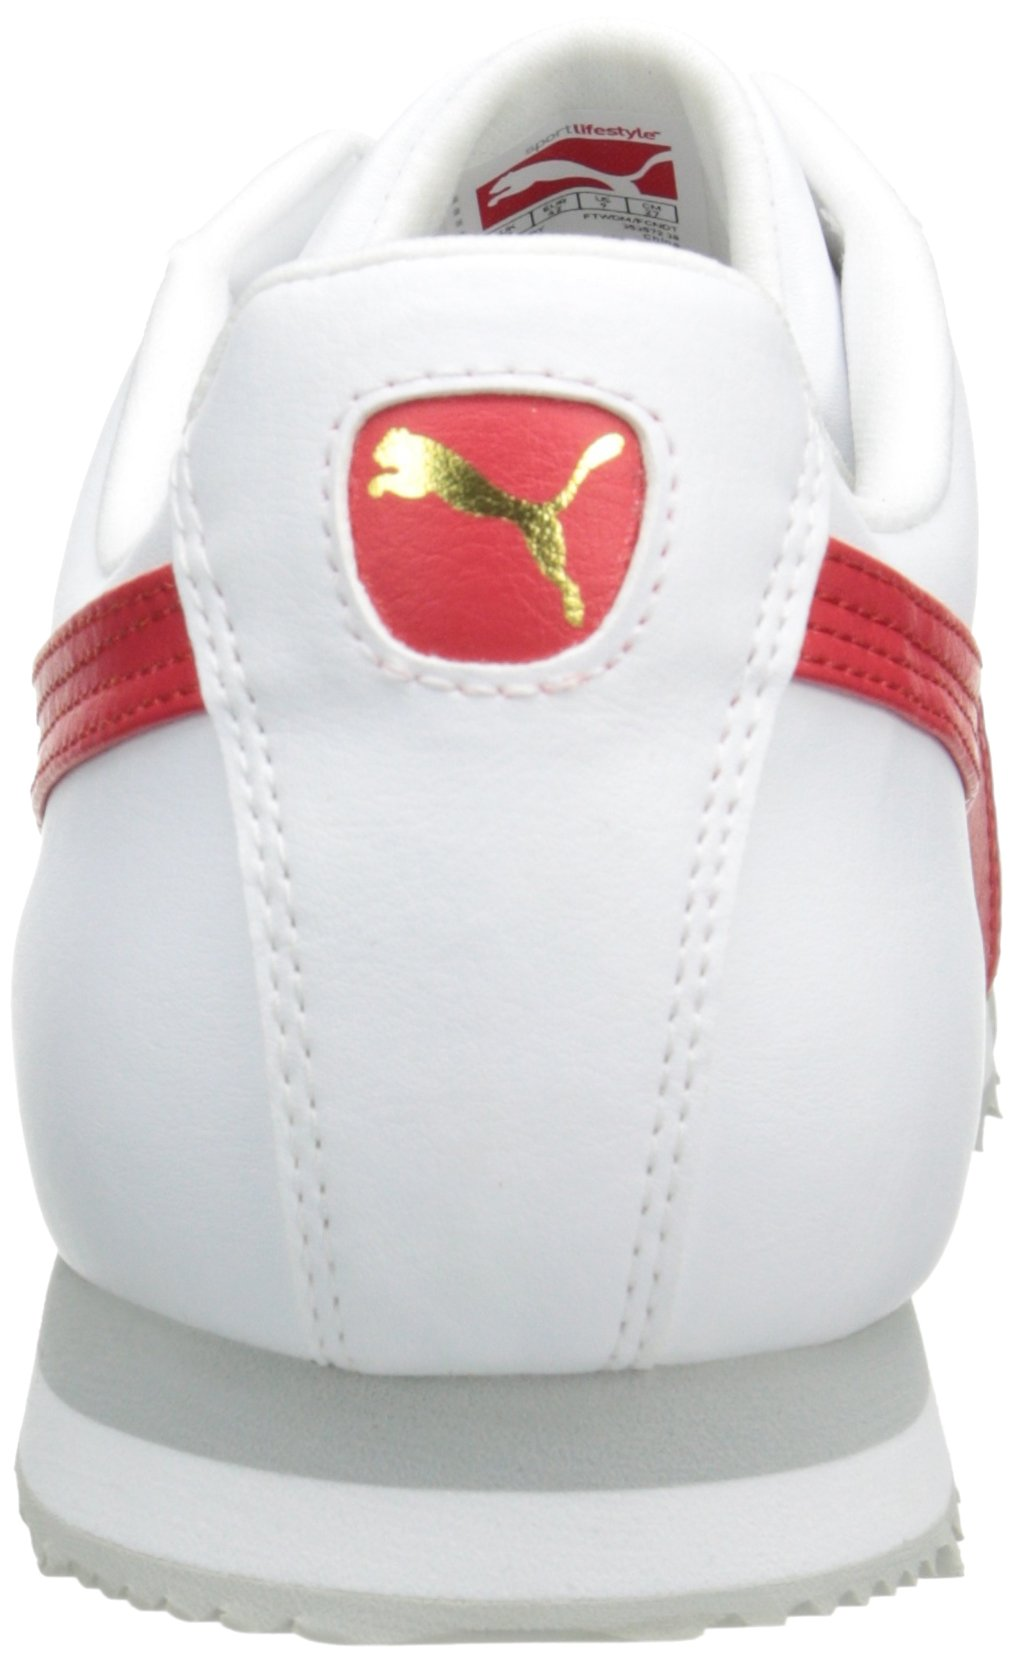 PUMA Men's Roma Basic Fashion Sneaker, White/High Risk Red/White - 9 D(M) US by PUMA (Image #2)